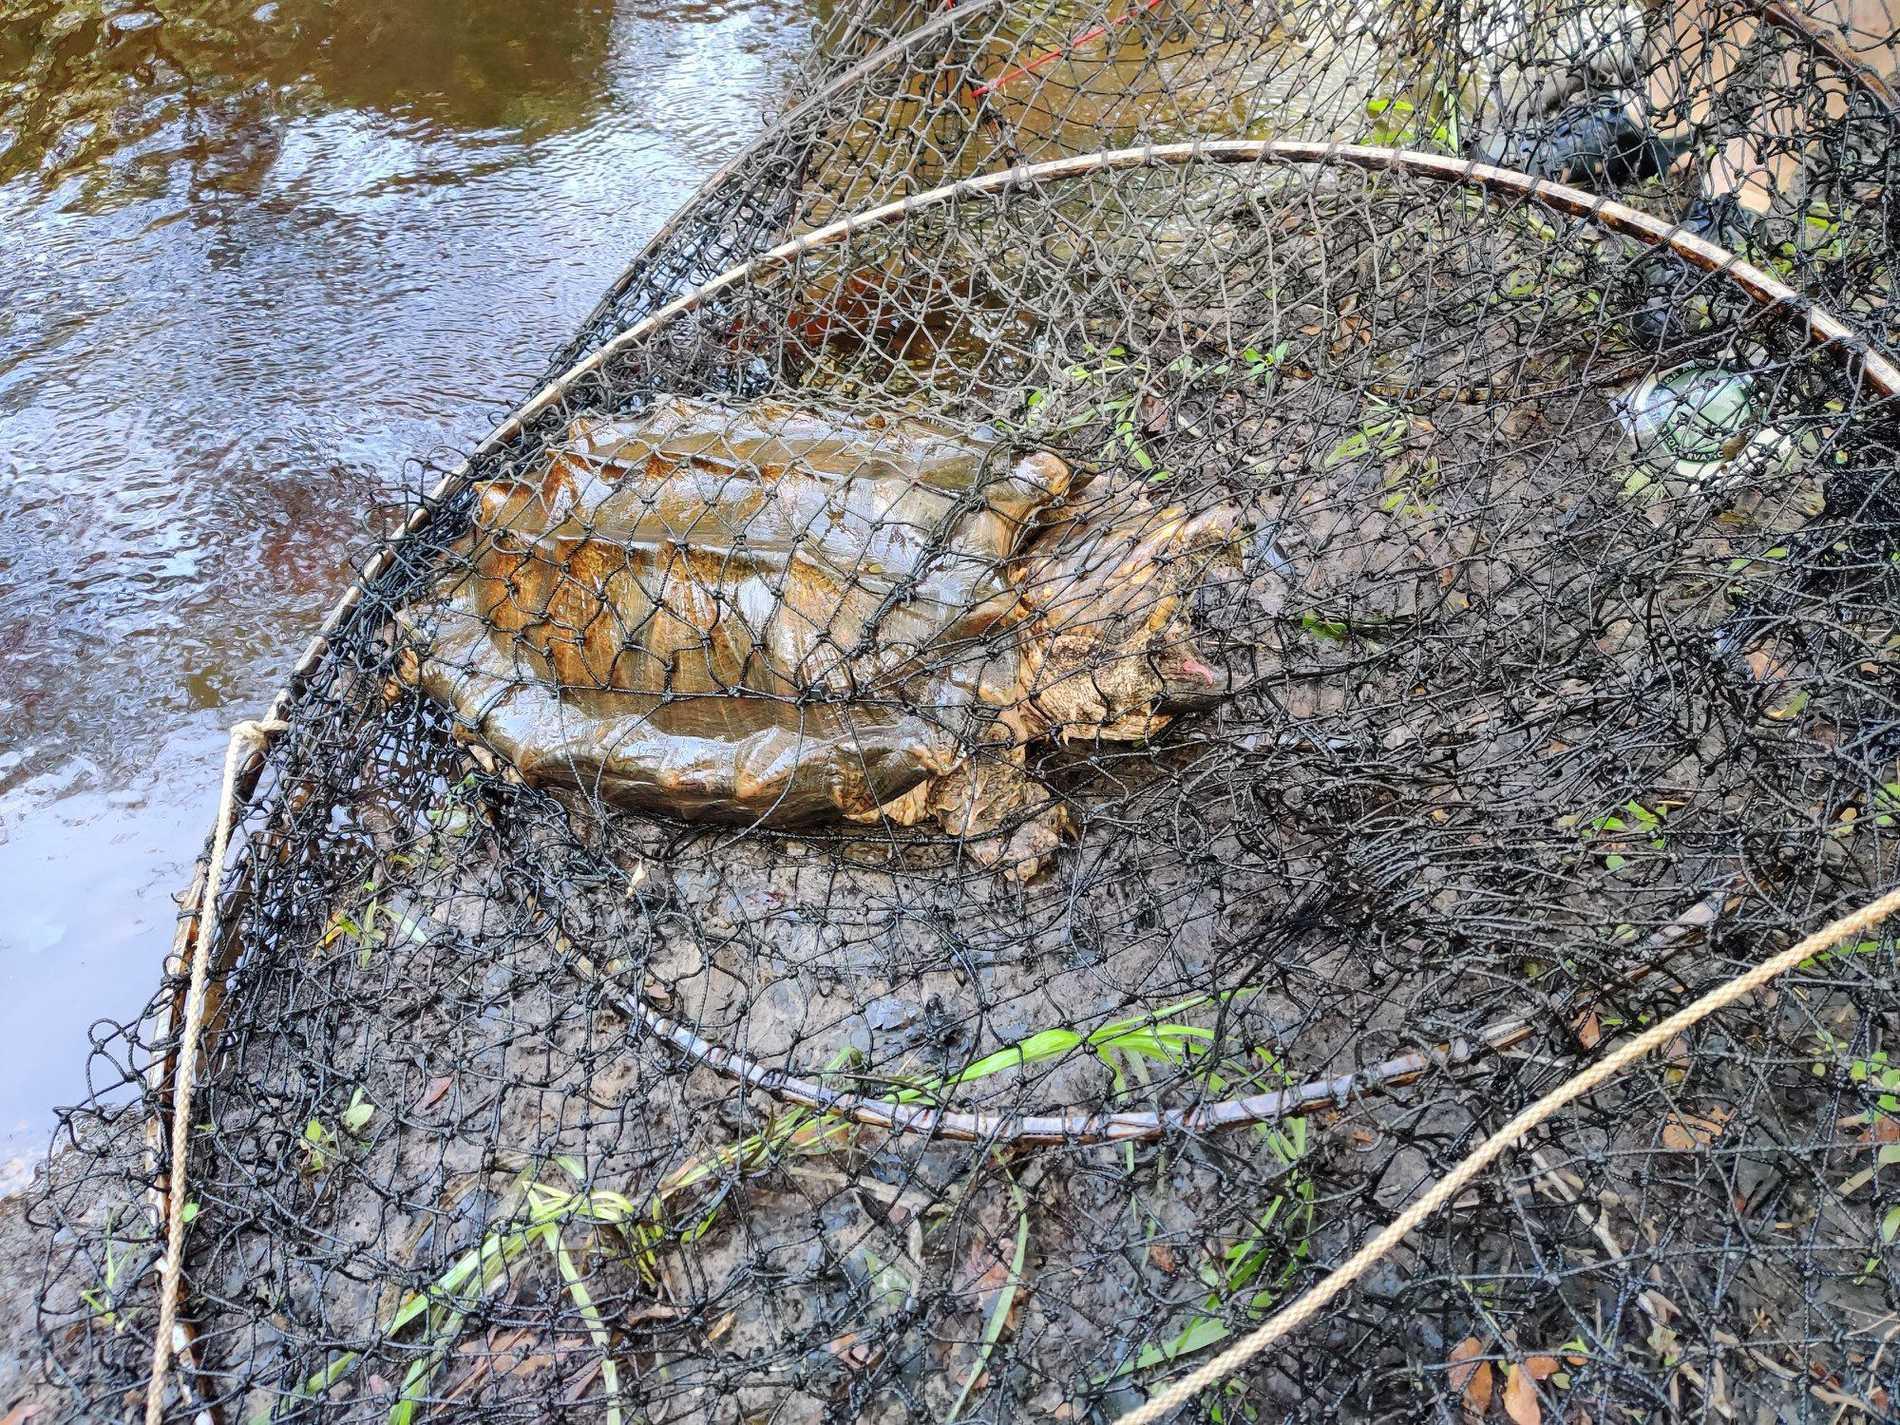 Alligatorsköldpaddorna släpptes efter fotografering ut i det fria igen.